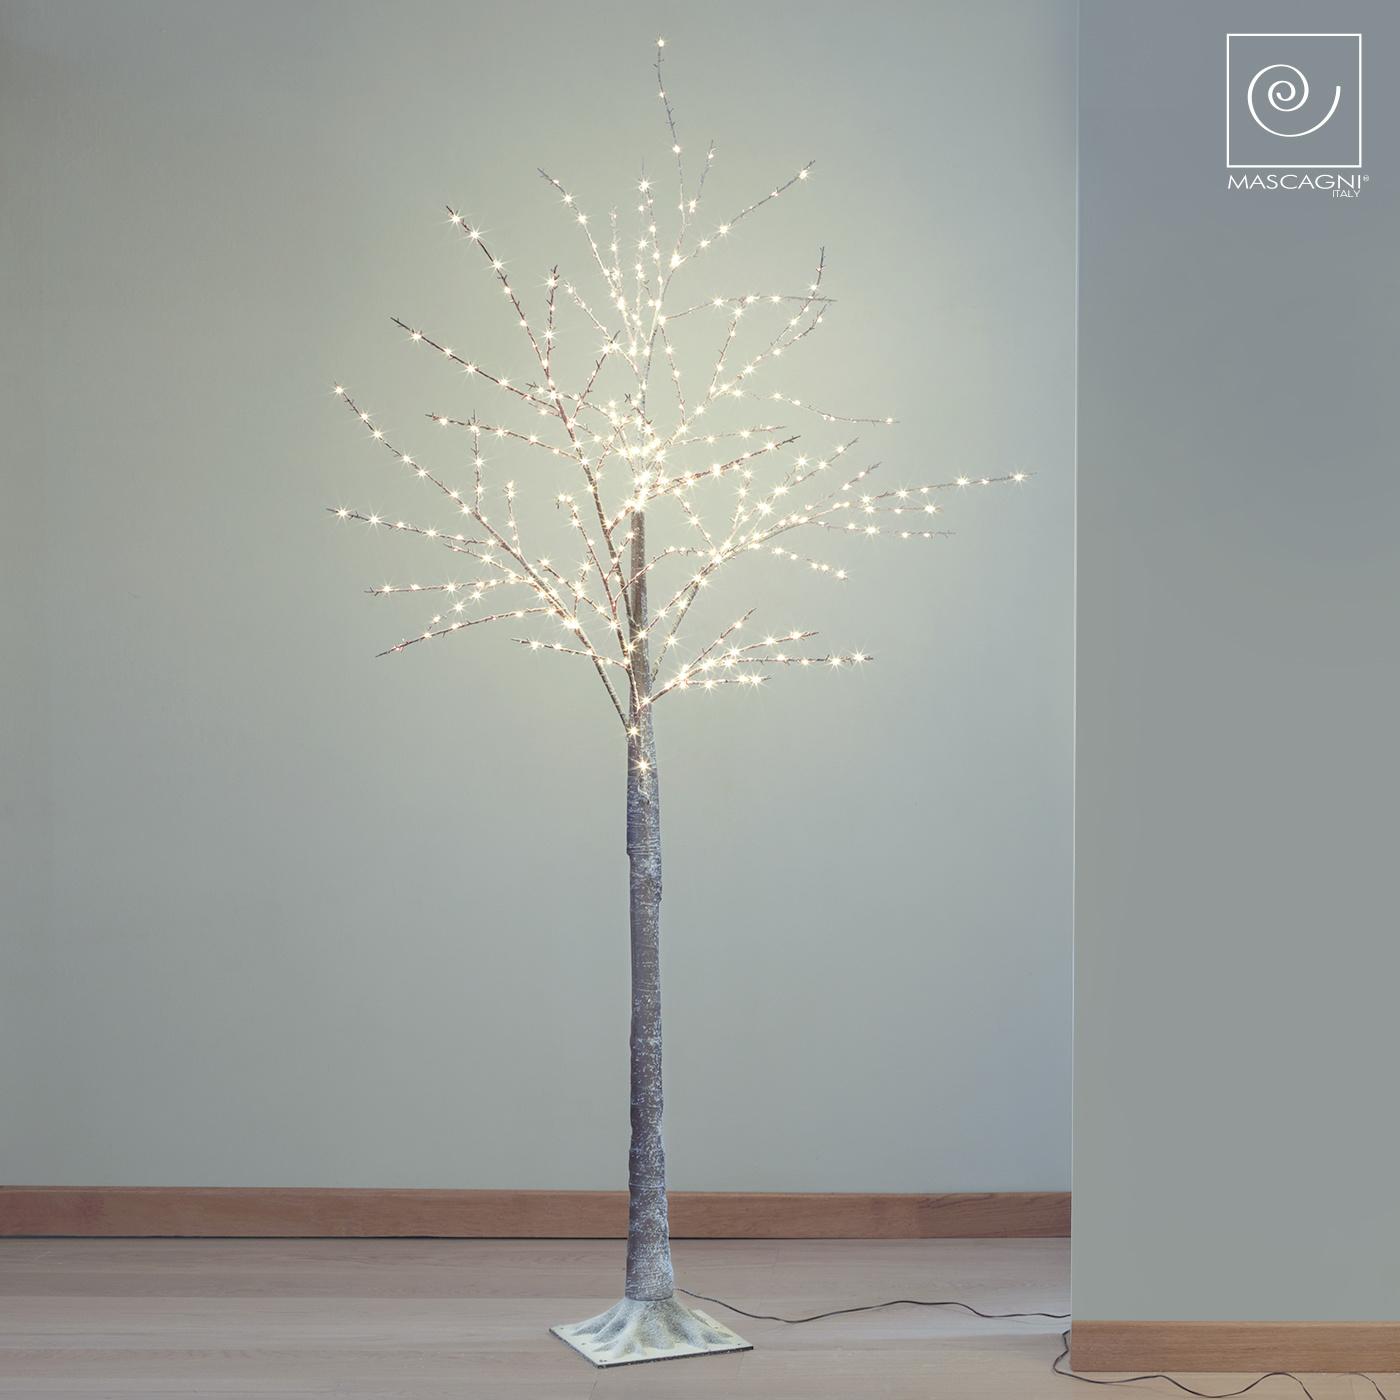 Art Mascagni LED TREE CM.150